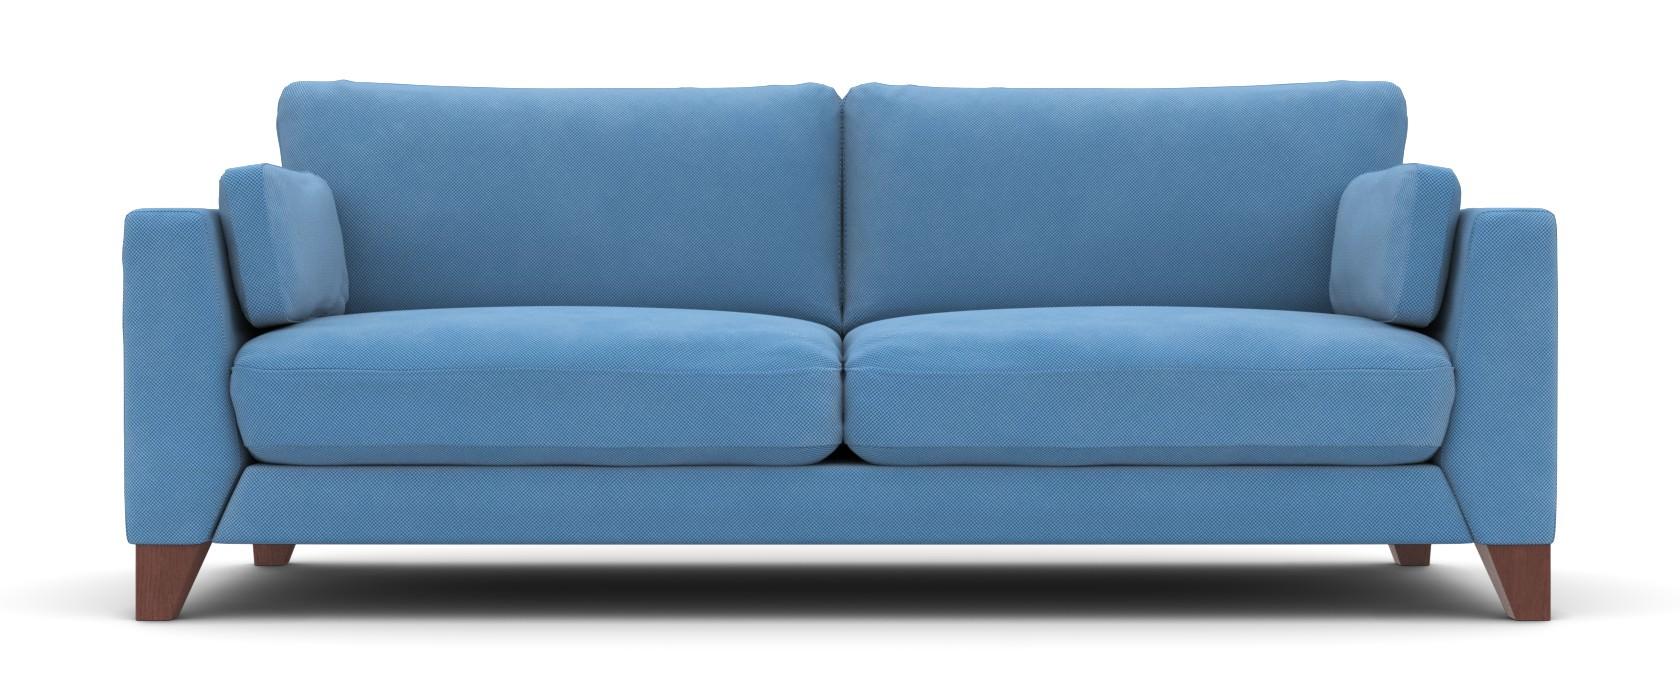 Трехместный диван Paolo